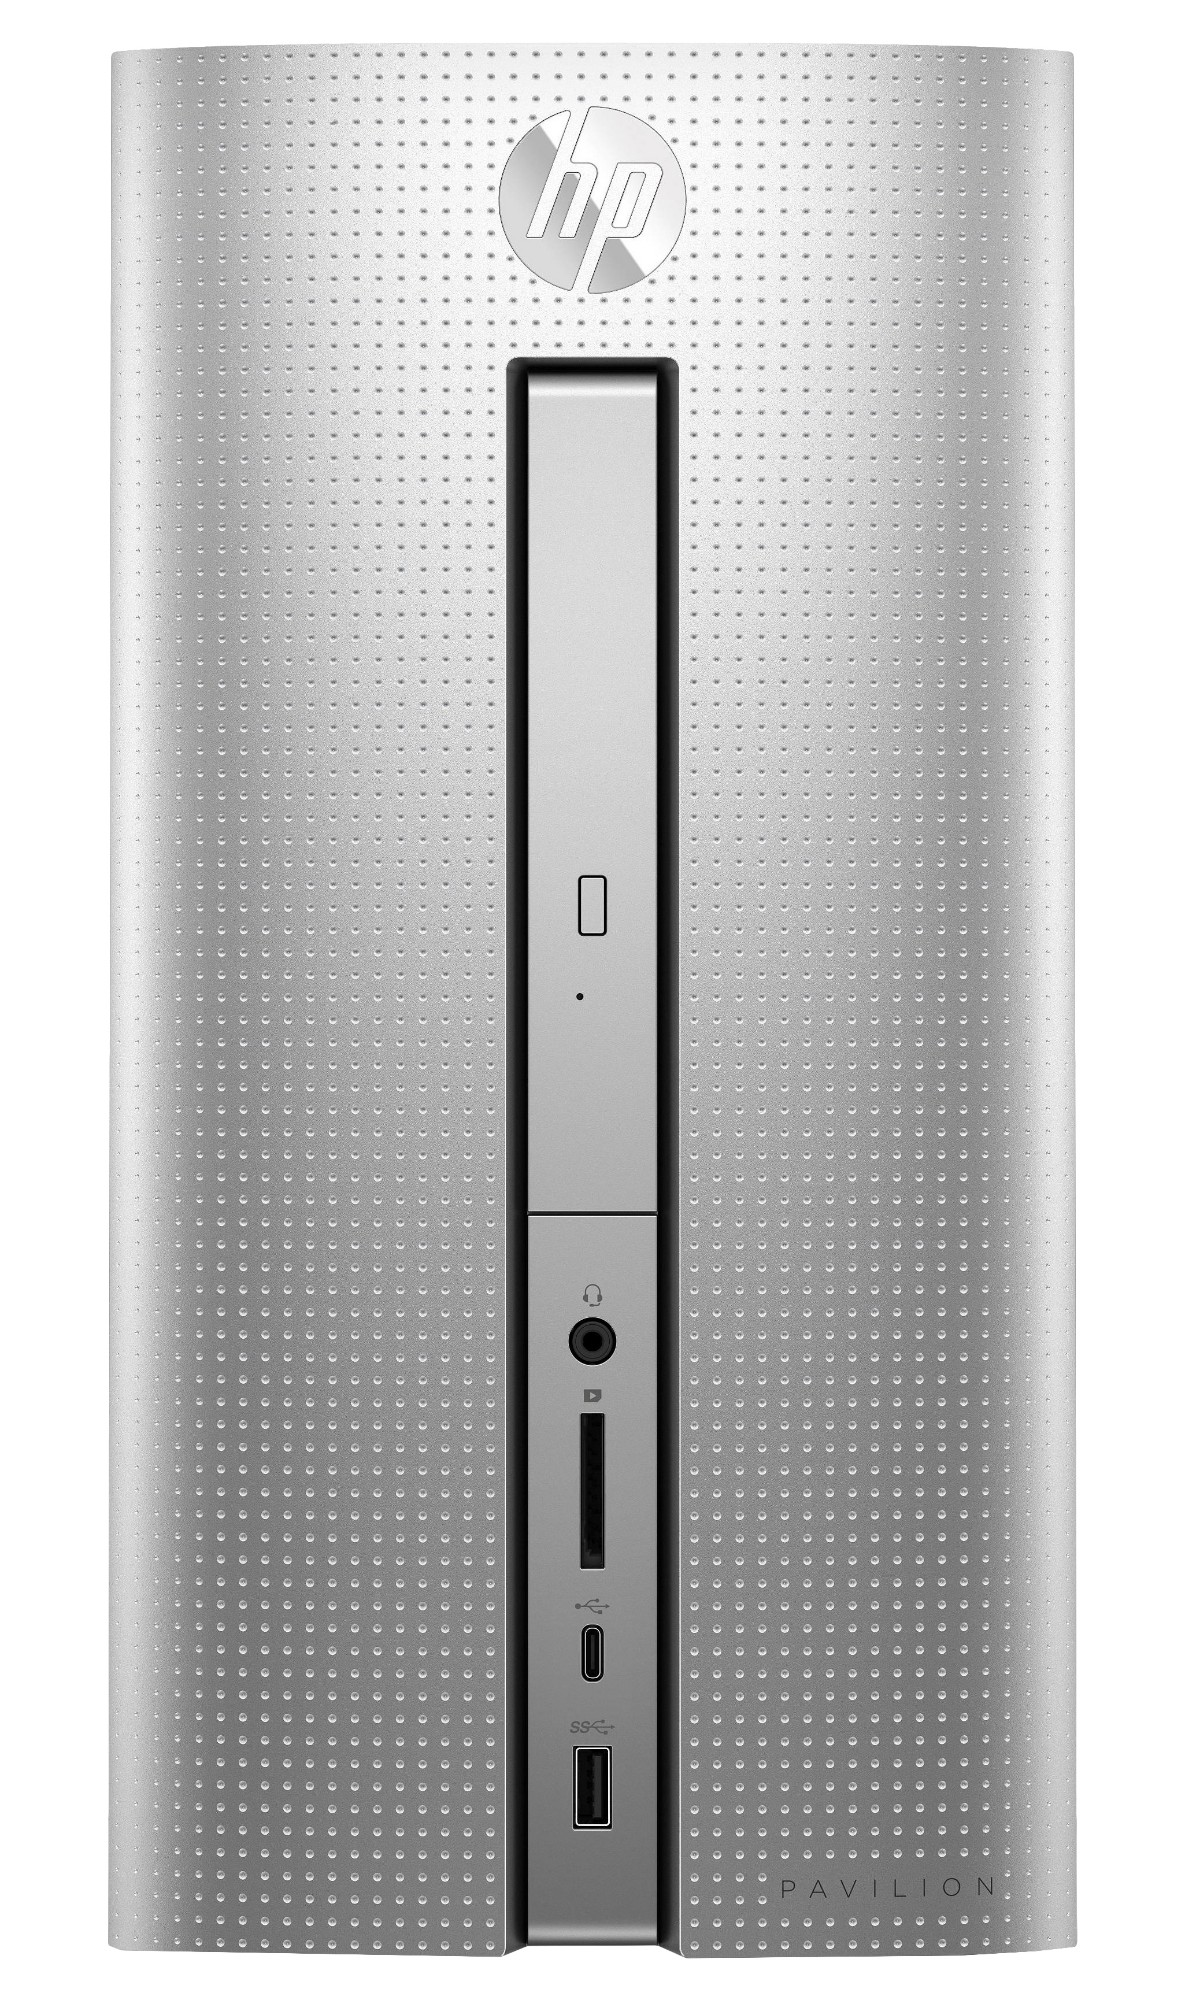 HP Pavilion 570-p052na 3GHz i5-7400 Mini Tower 7th gen Intel® Core™ i5 Silver PC